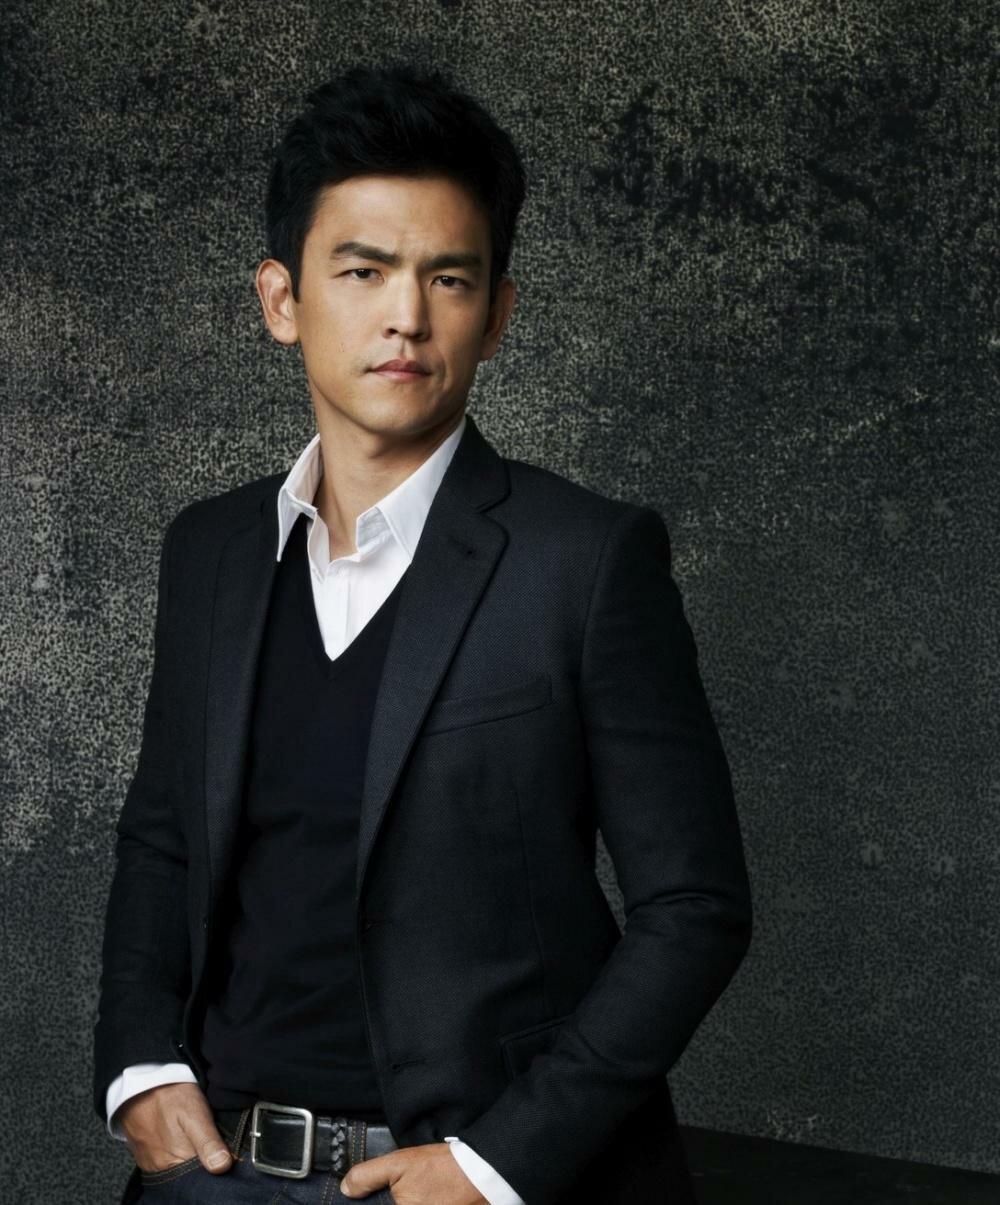 азиатские мужчины фото